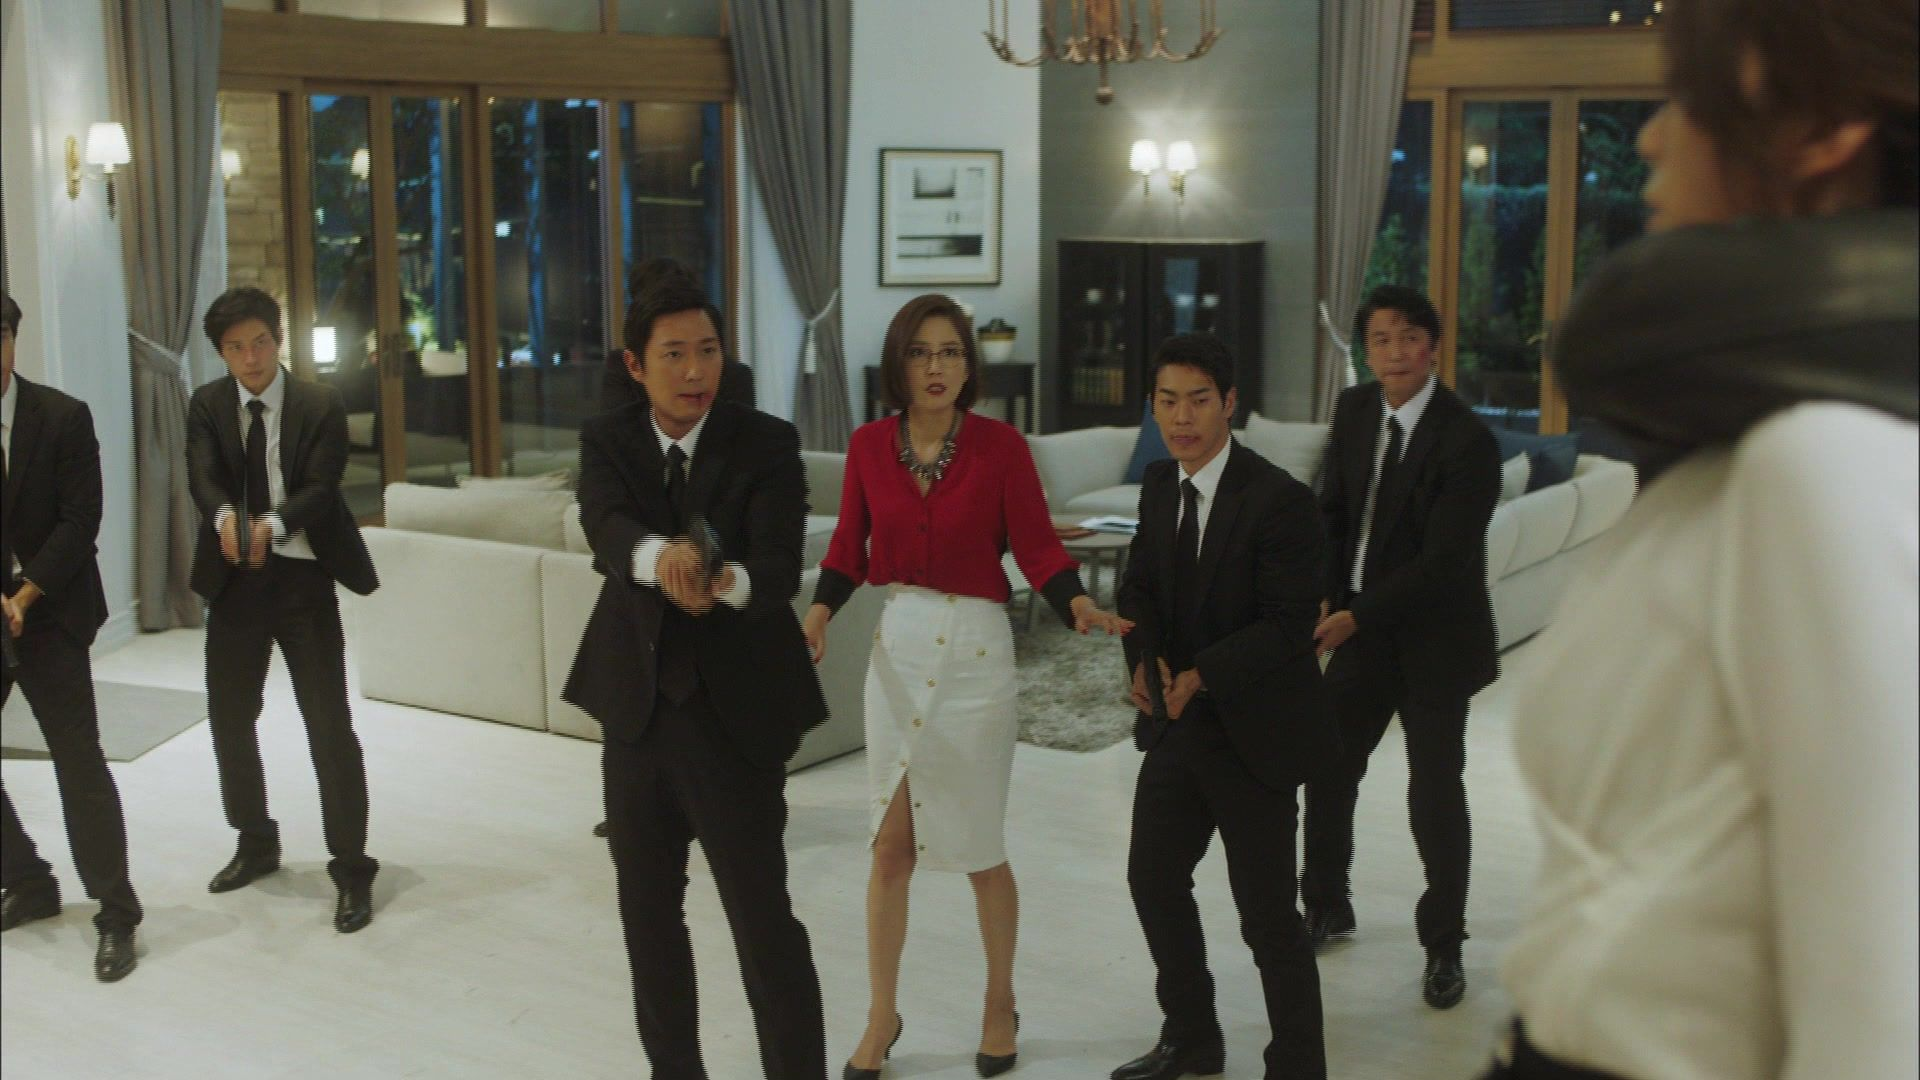 The K2 Episode 2 - THE K2 - Watch Full Episodes Free - Korea